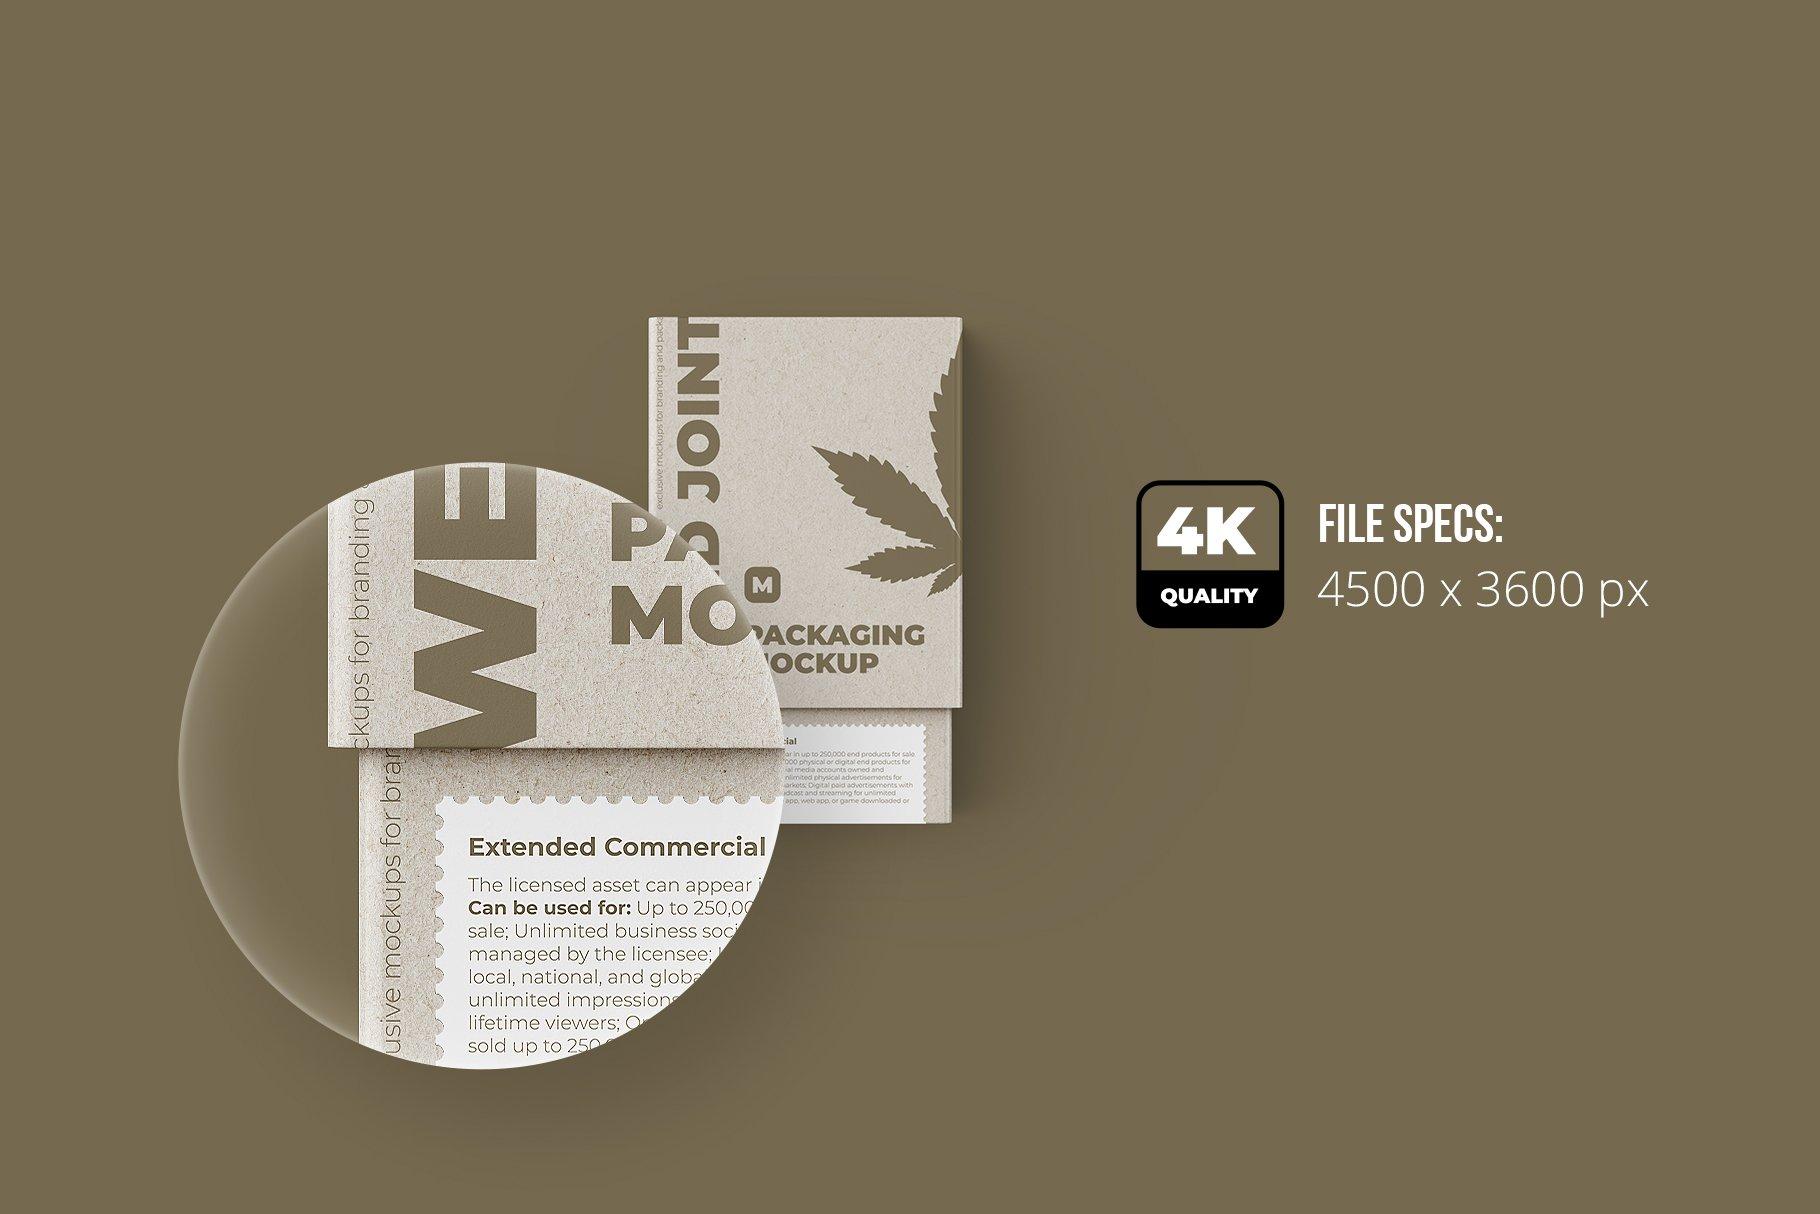 烟草香烟雪茄包装纸盒设计展示贴图样机 Weed Joint Packaging Mockup插图2